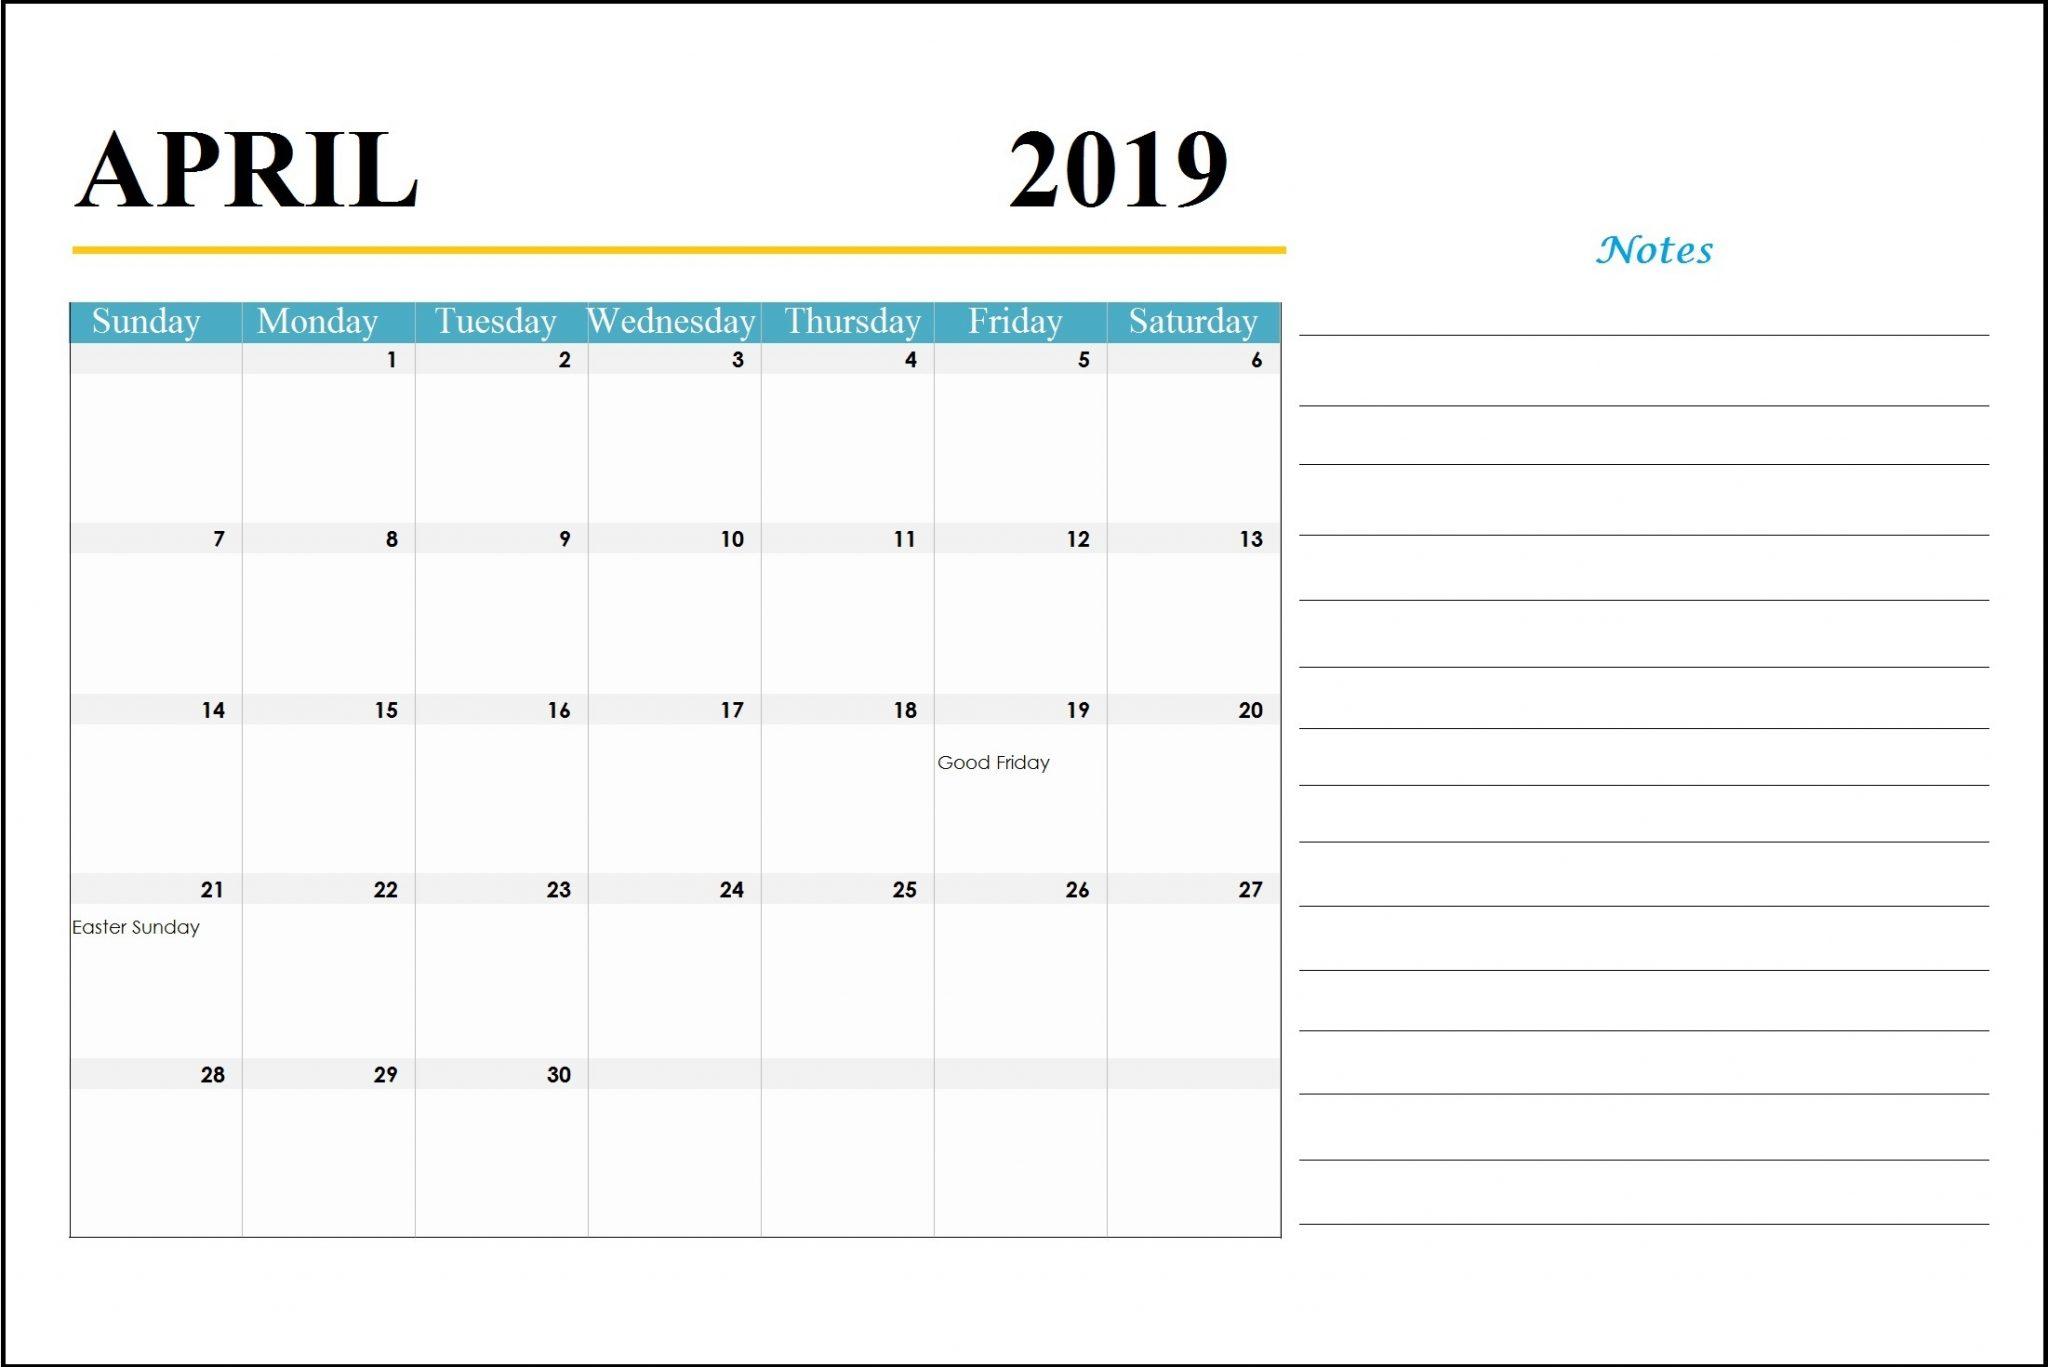 April 2019 Holidays Calendar